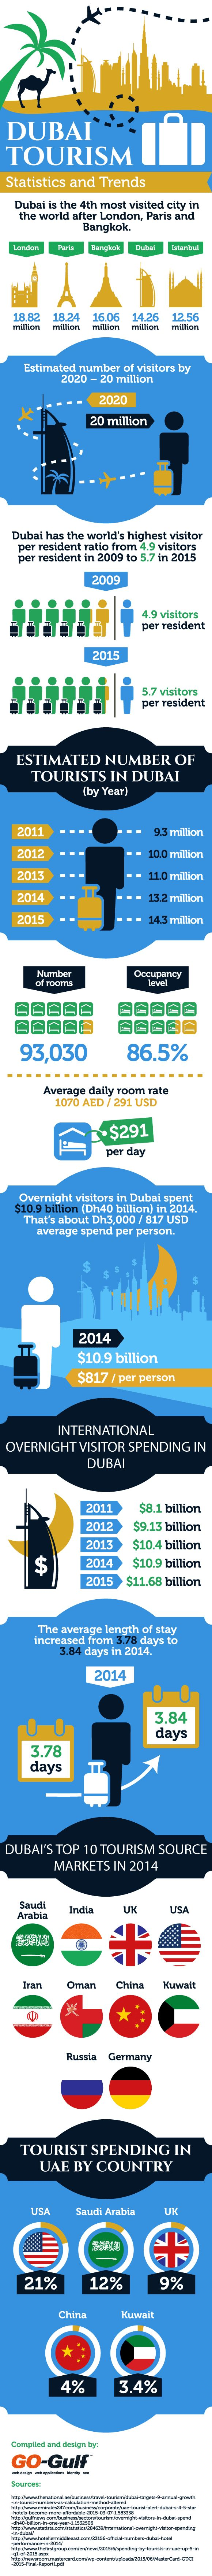 Dubai Tourism Statistics and Trends #Infographic ~ Visualistan